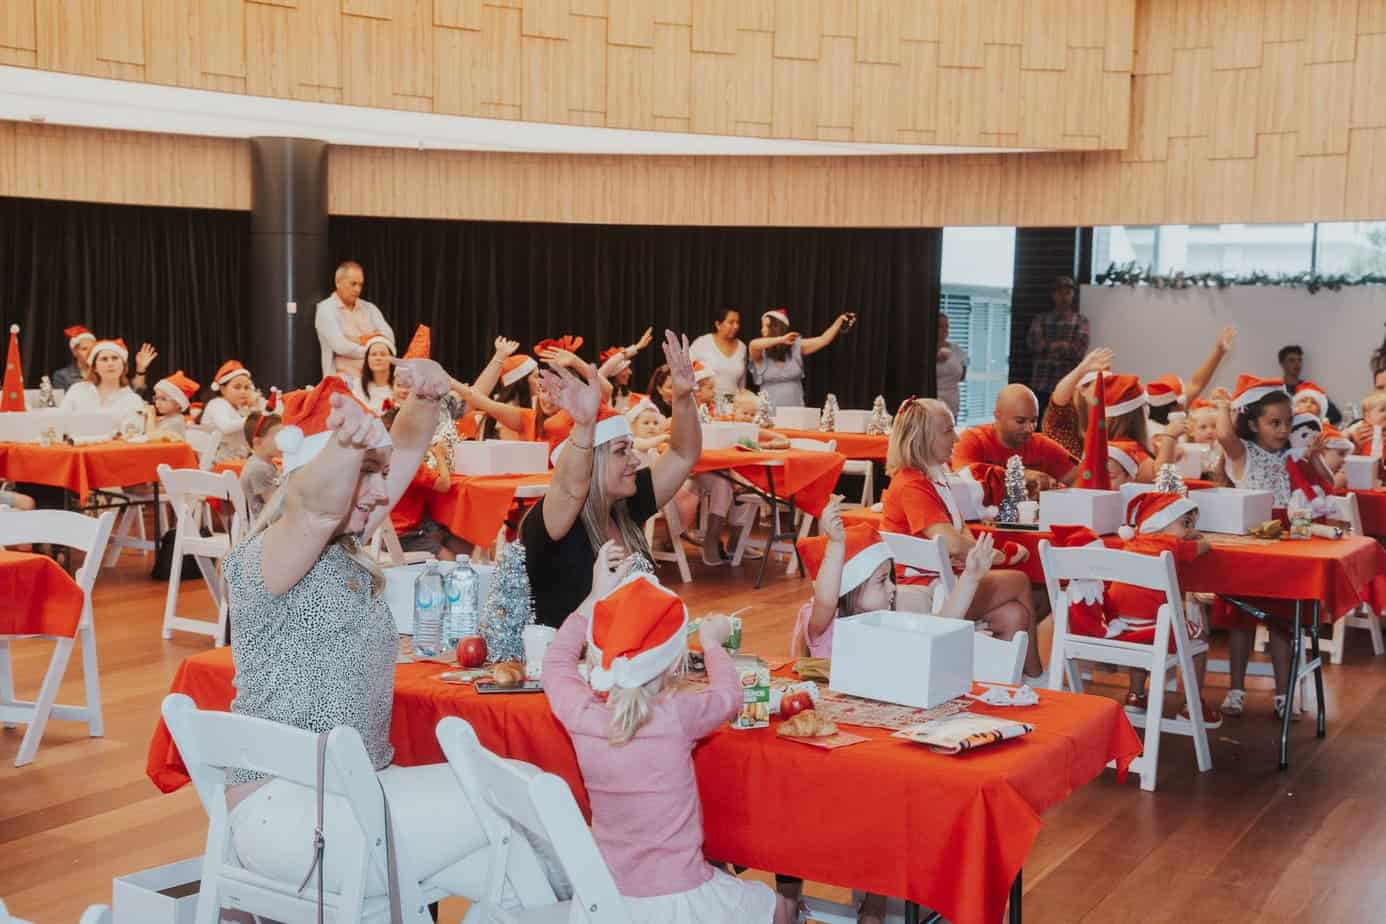 NEWOPENING_Sydney_photo_event_francesca_bandiera_